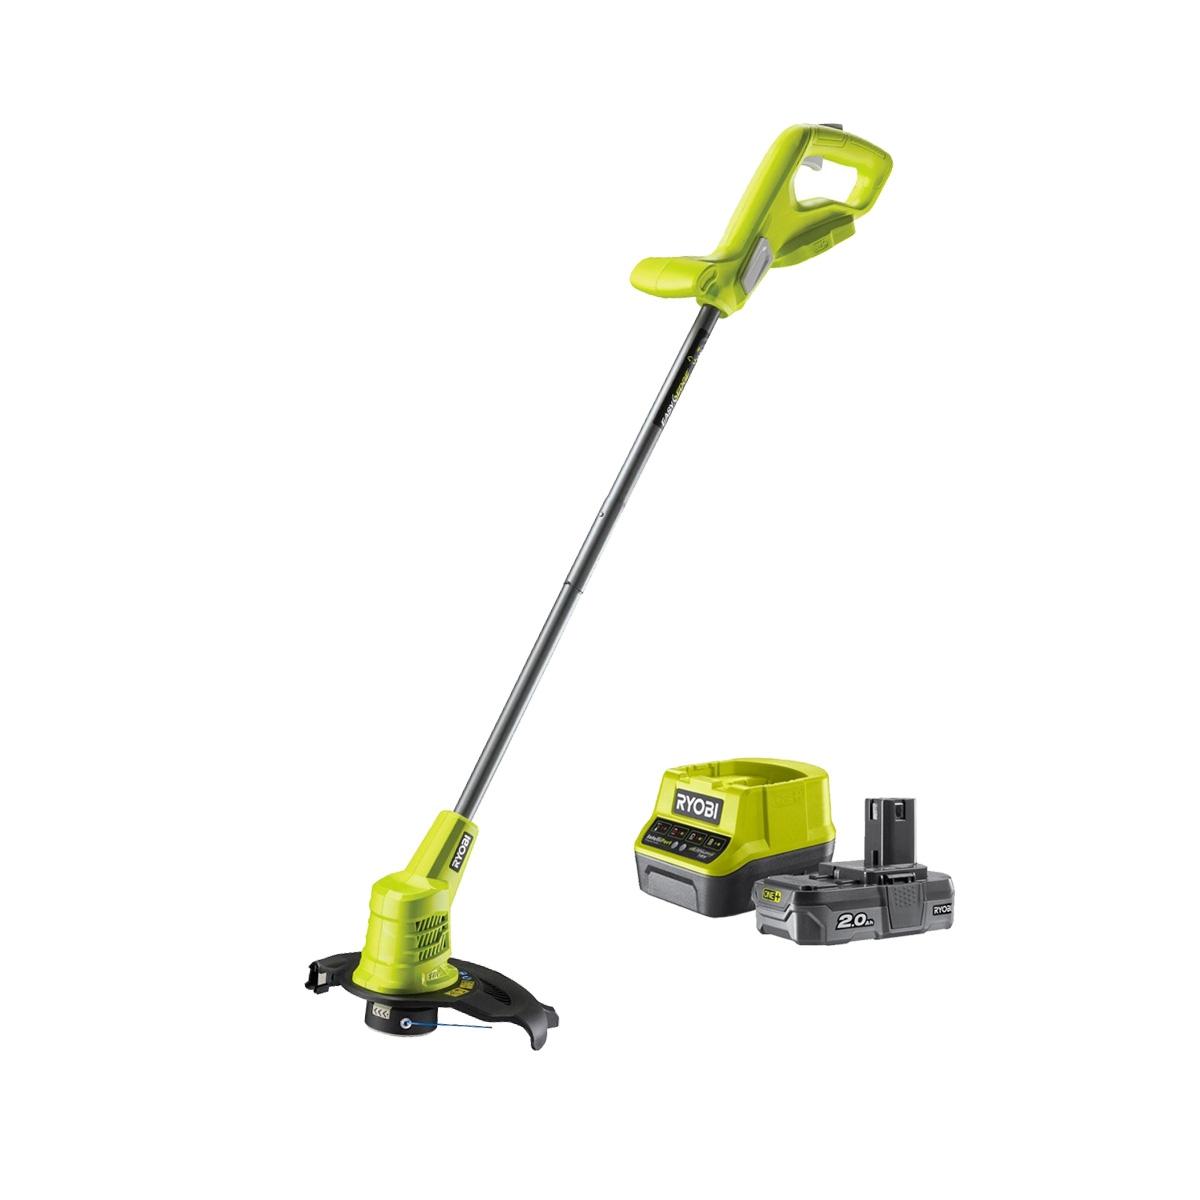 Ryobi OLT1825M Cordless grass trimmer